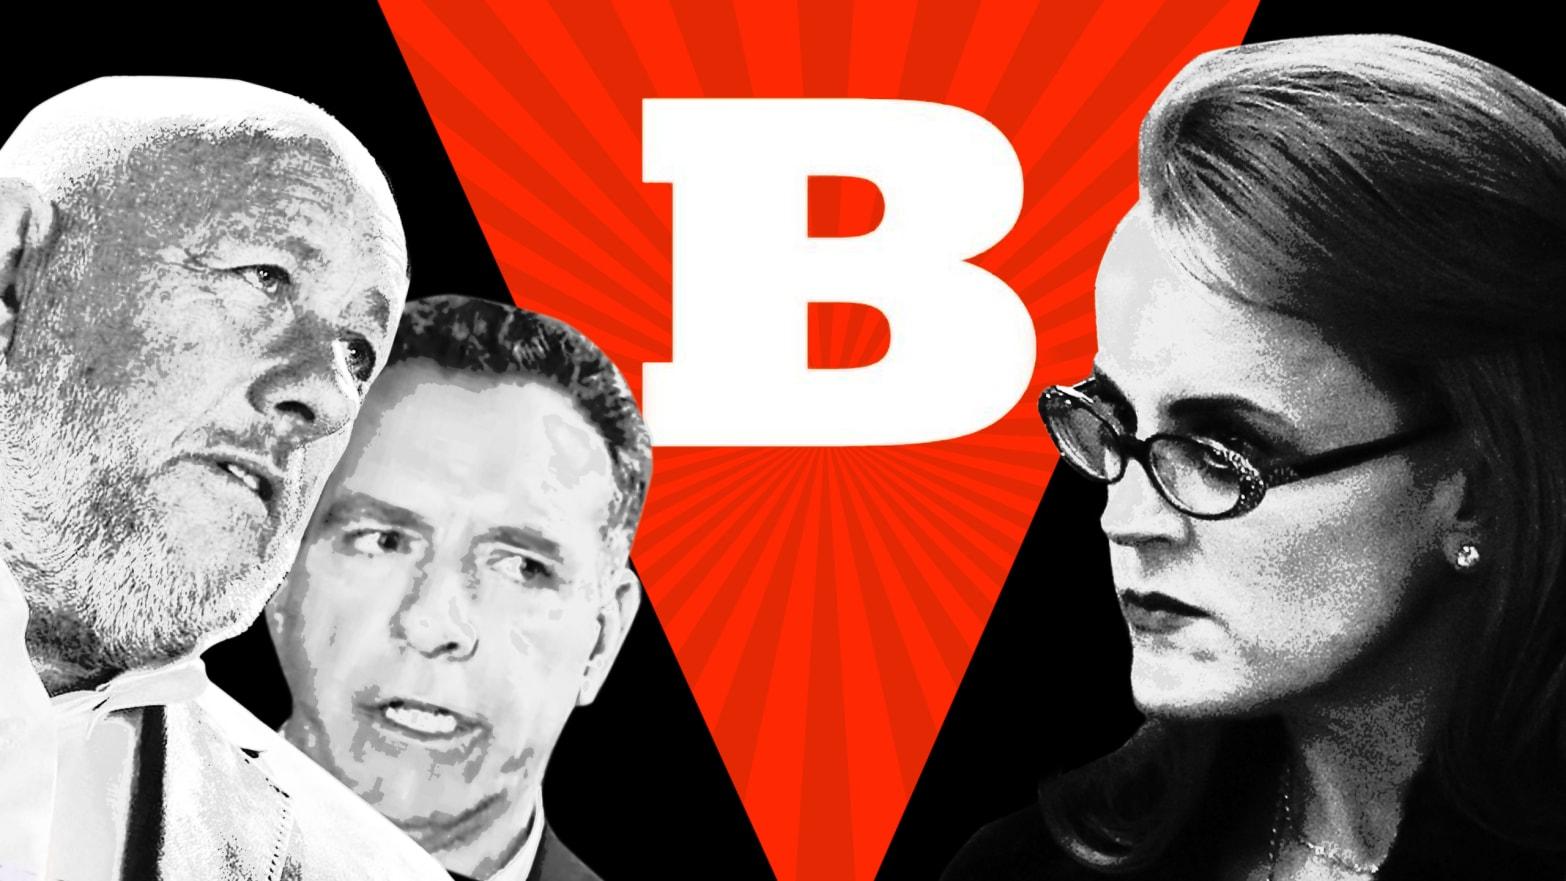 A Lot of Butthurt to Go Around' as Breitbart Battle Splits Billionaires